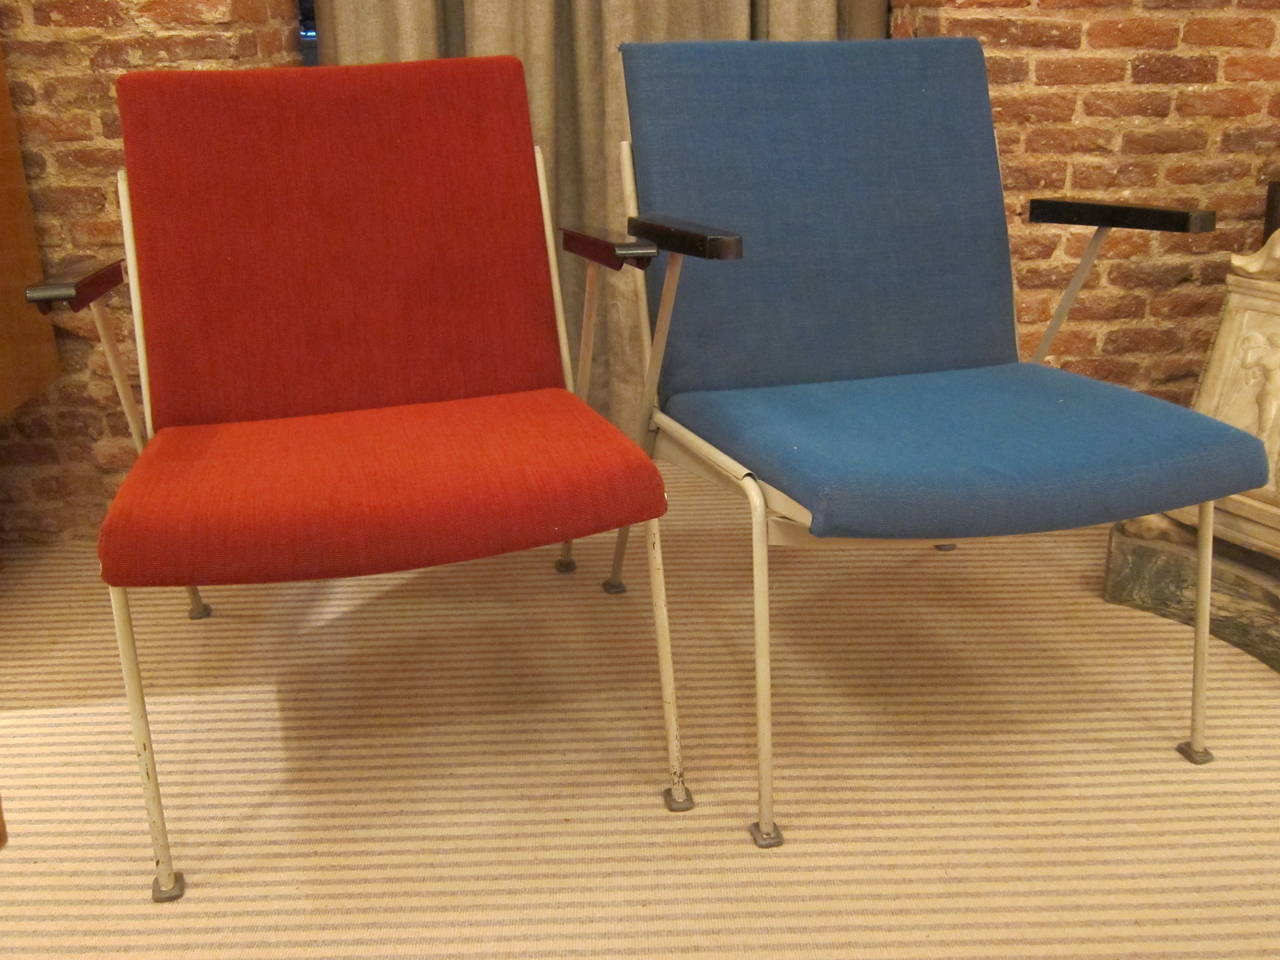 jeanneret for maison radieuse of le corbusier pair of. Black Bedroom Furniture Sets. Home Design Ideas